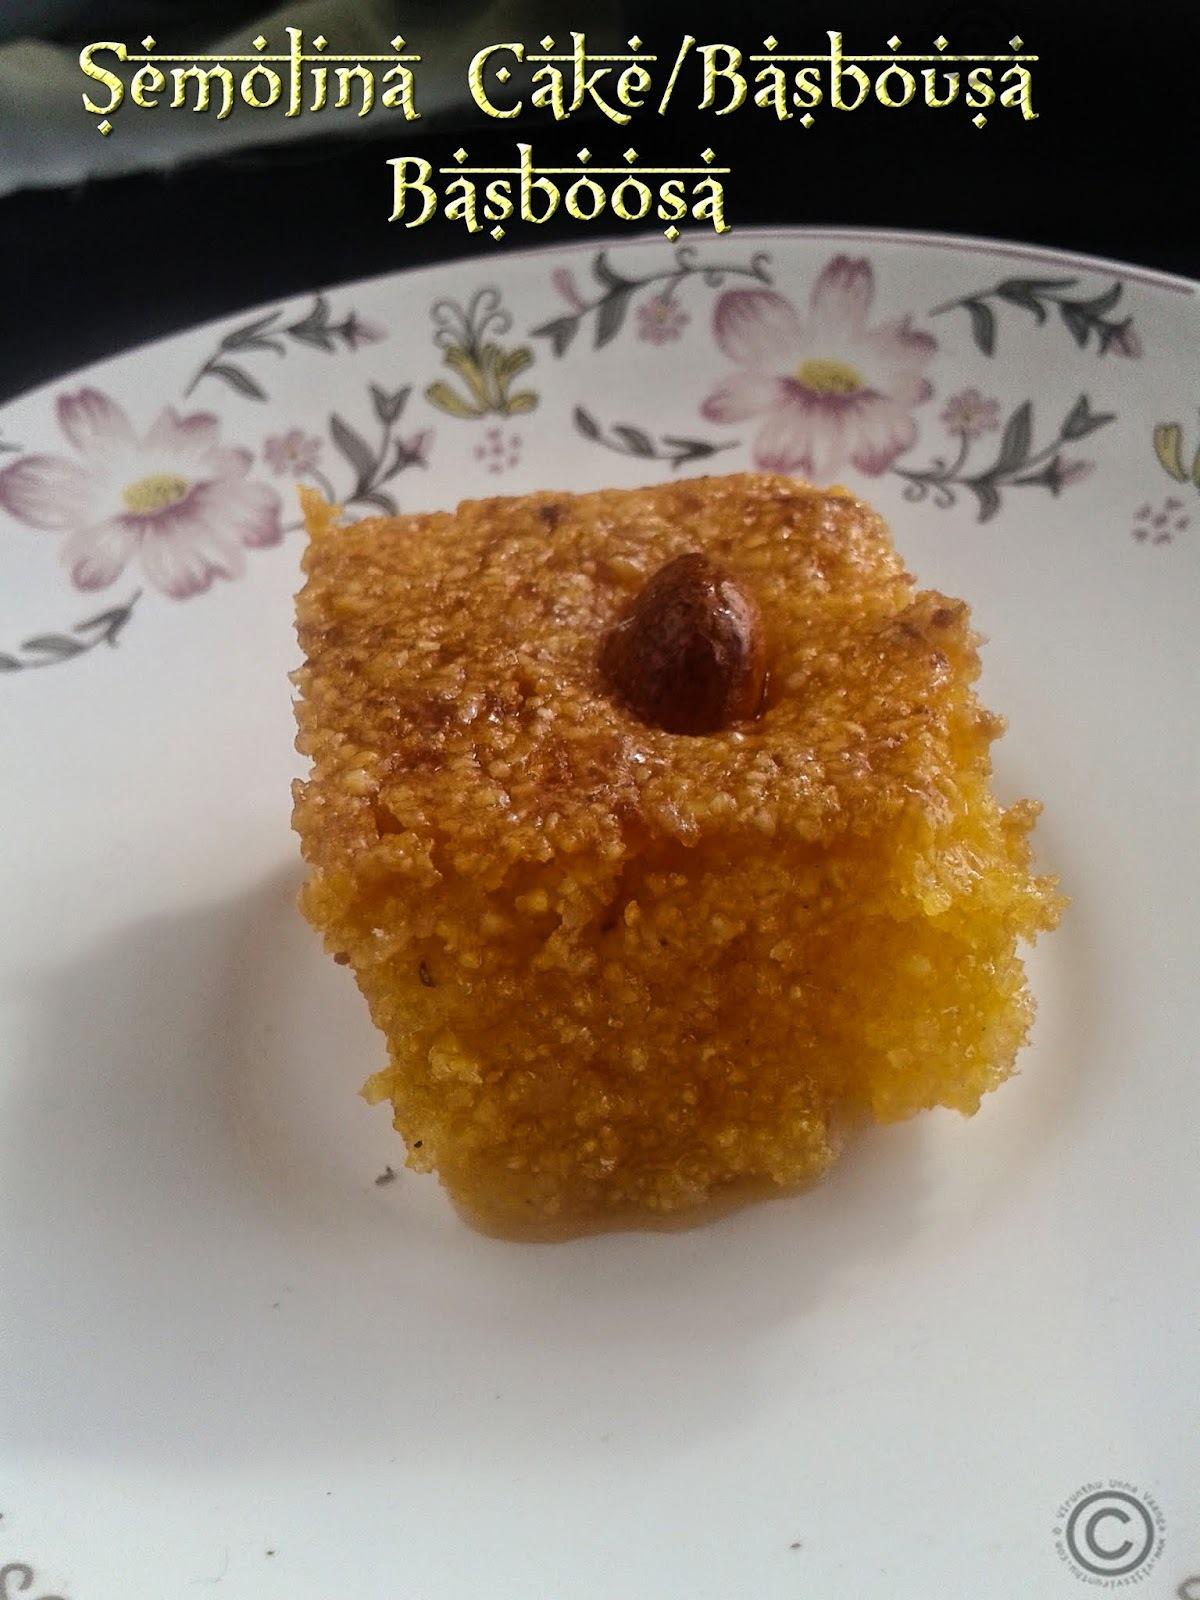 EGGLESS SEMOLINA CAKE I BASBOUSA I BASBOOSA I ARABIC DESSERT